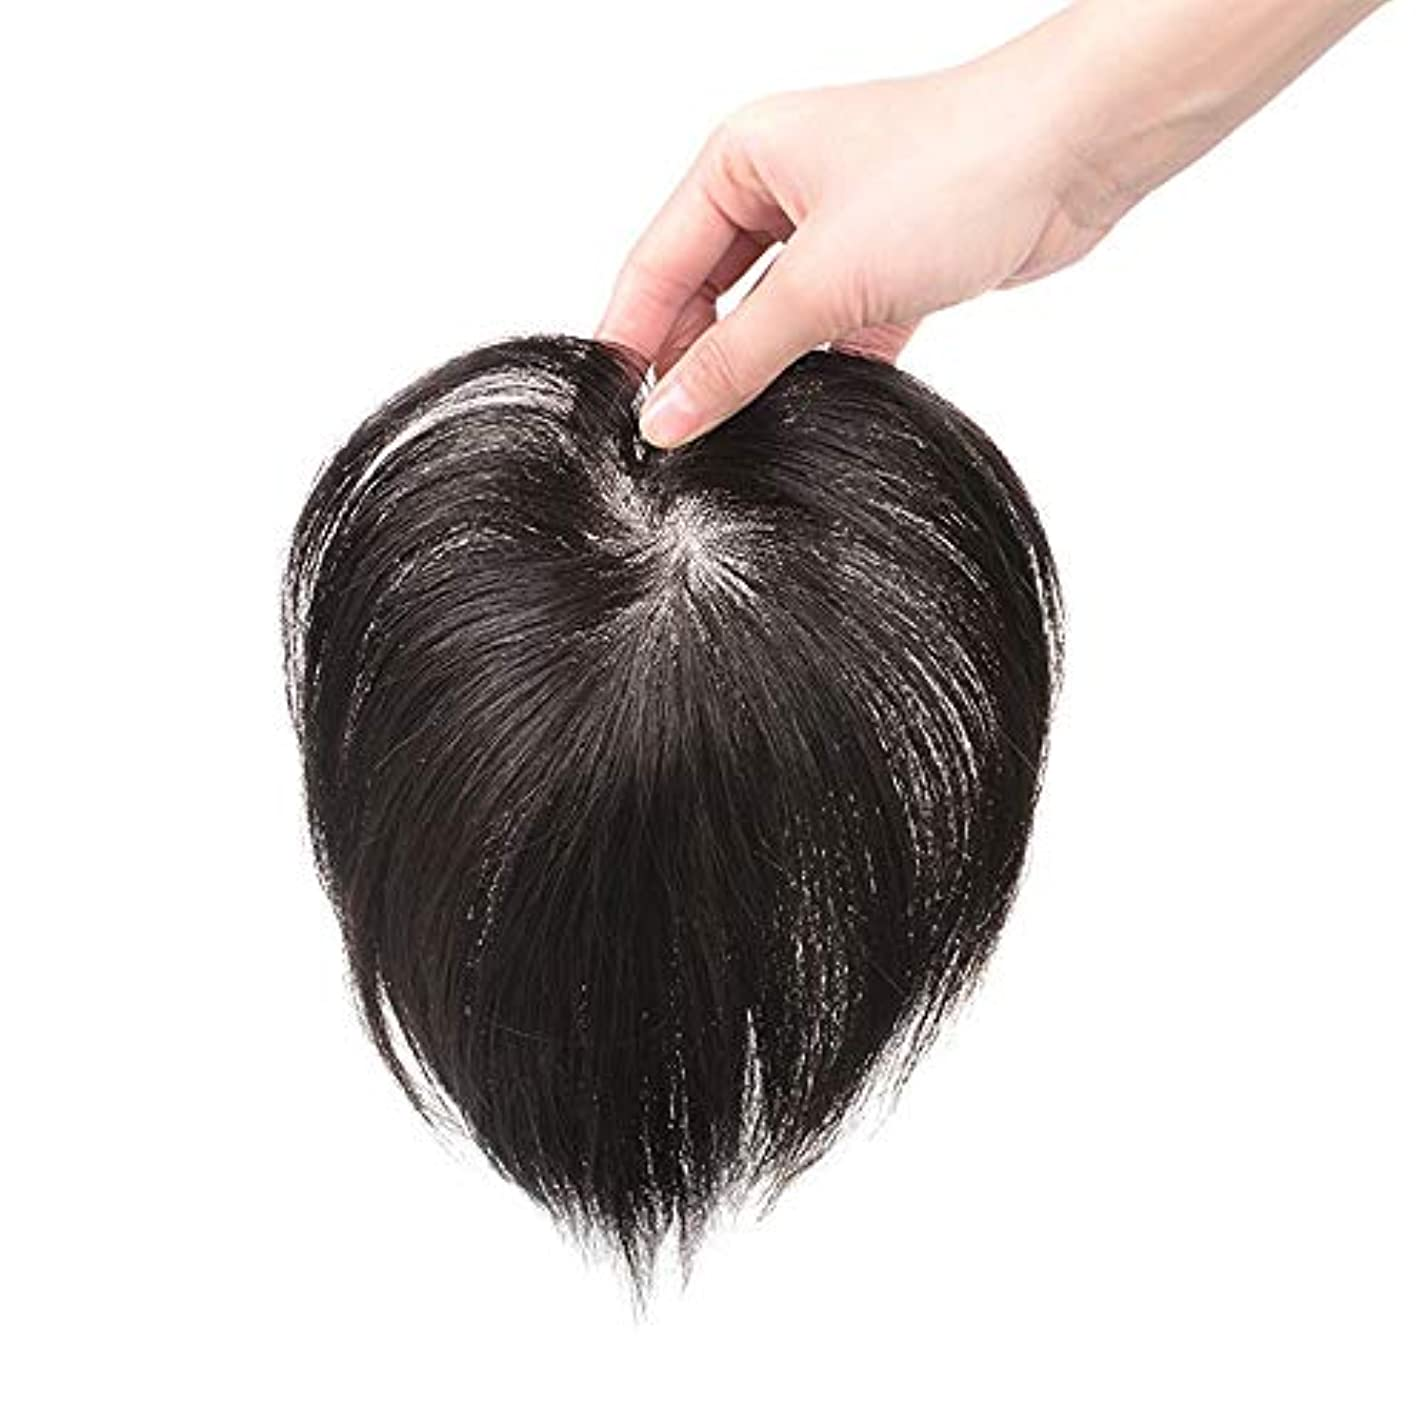 YESONEEP 女性の快適な薄いパーティーかつらのための100%本物の髪ストレートヘアウィッグのクリップ (色 : [7x10] 30cm dark brown)